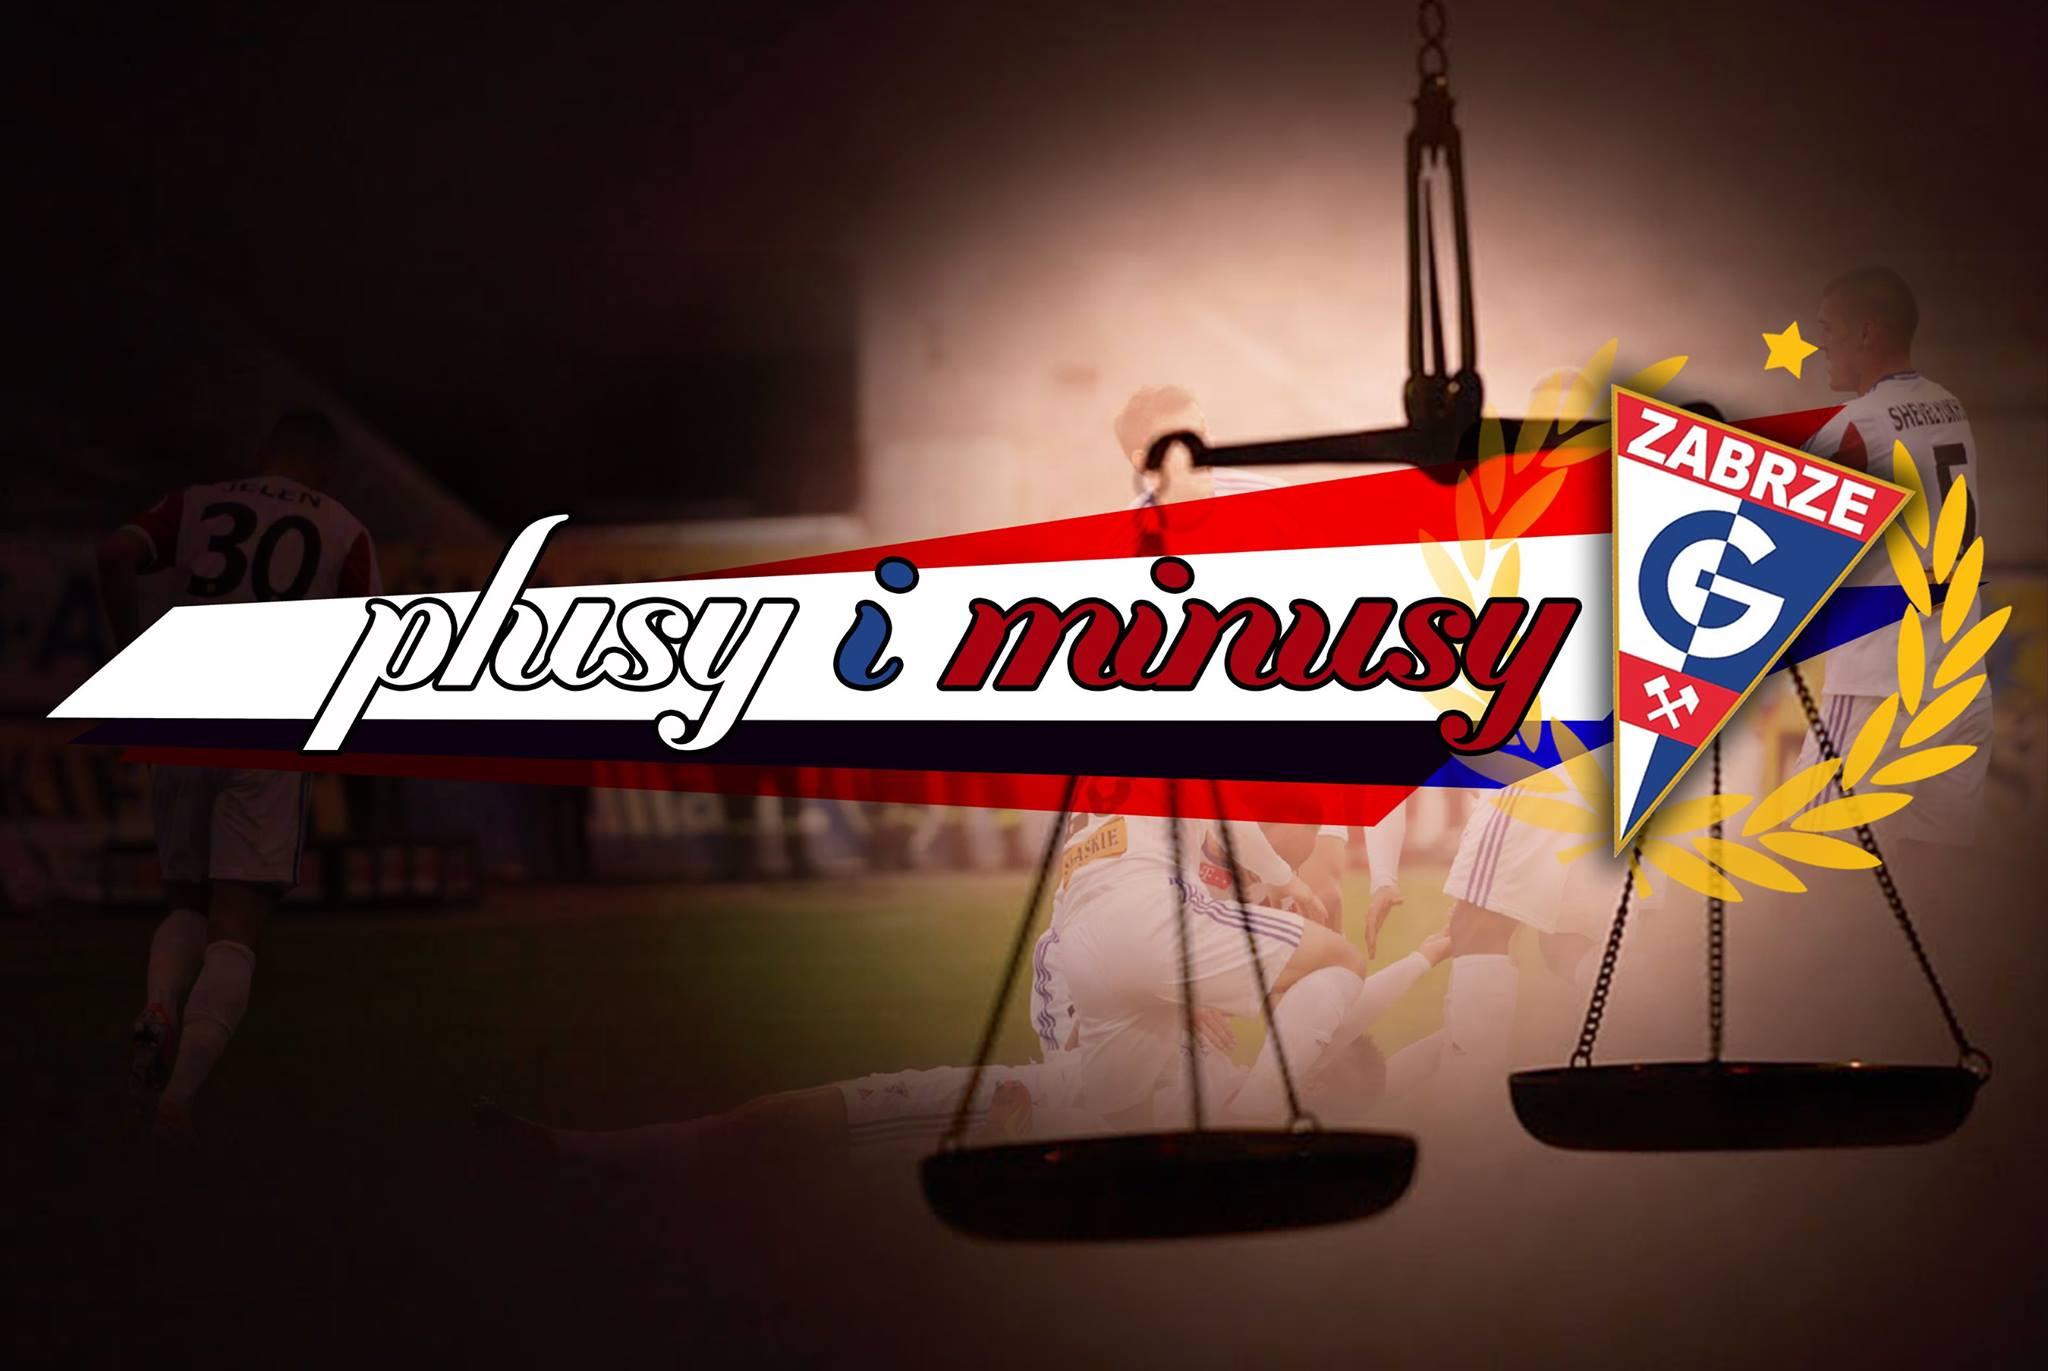 plusy_i_minusy